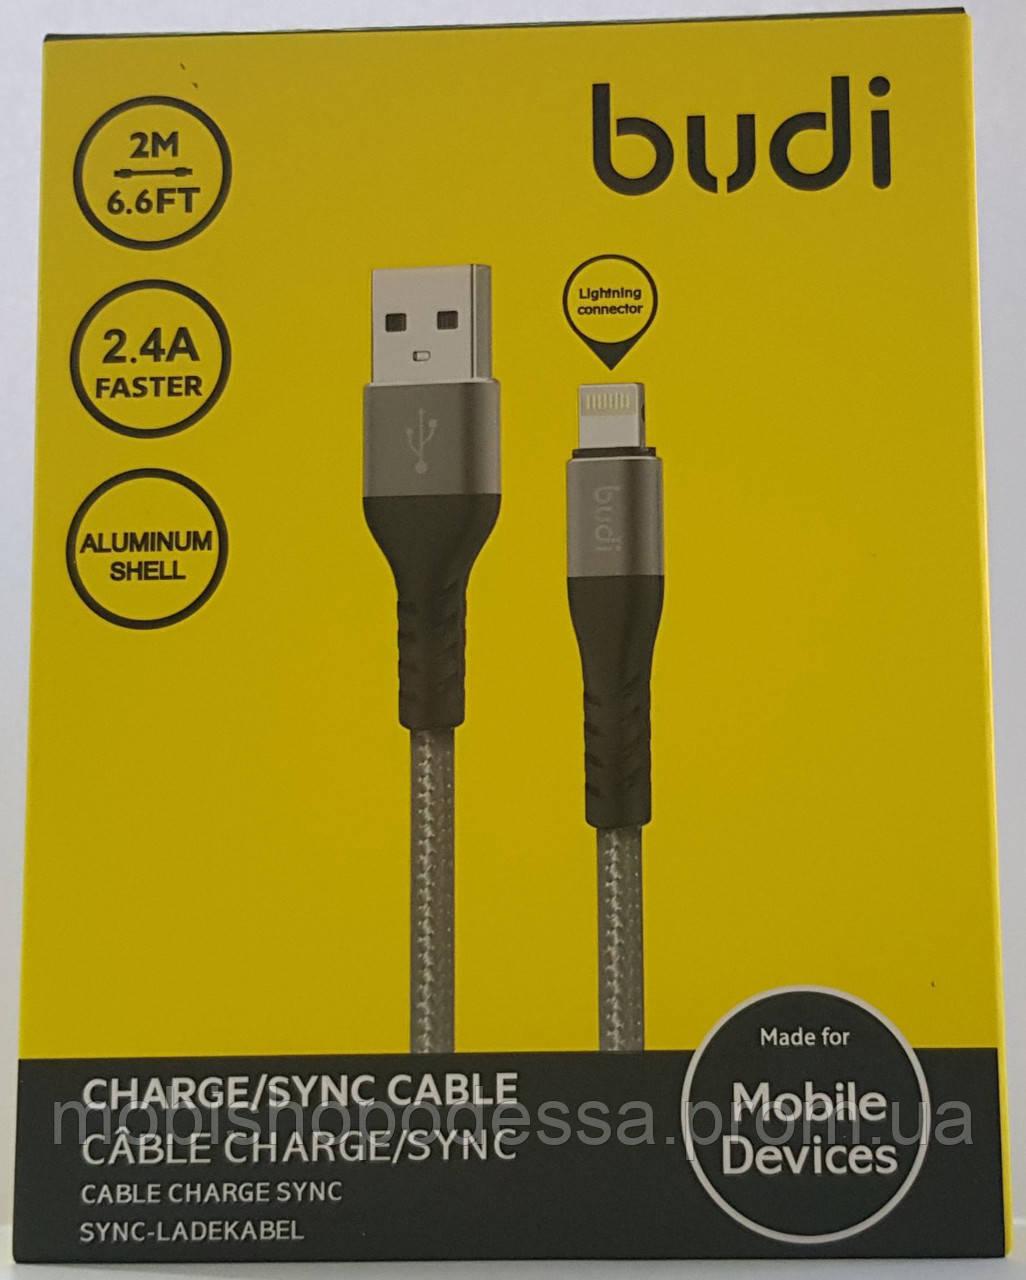 USB-кабель Budi Lightning to USB Charge/Sync 2м, M8J197L-GRY